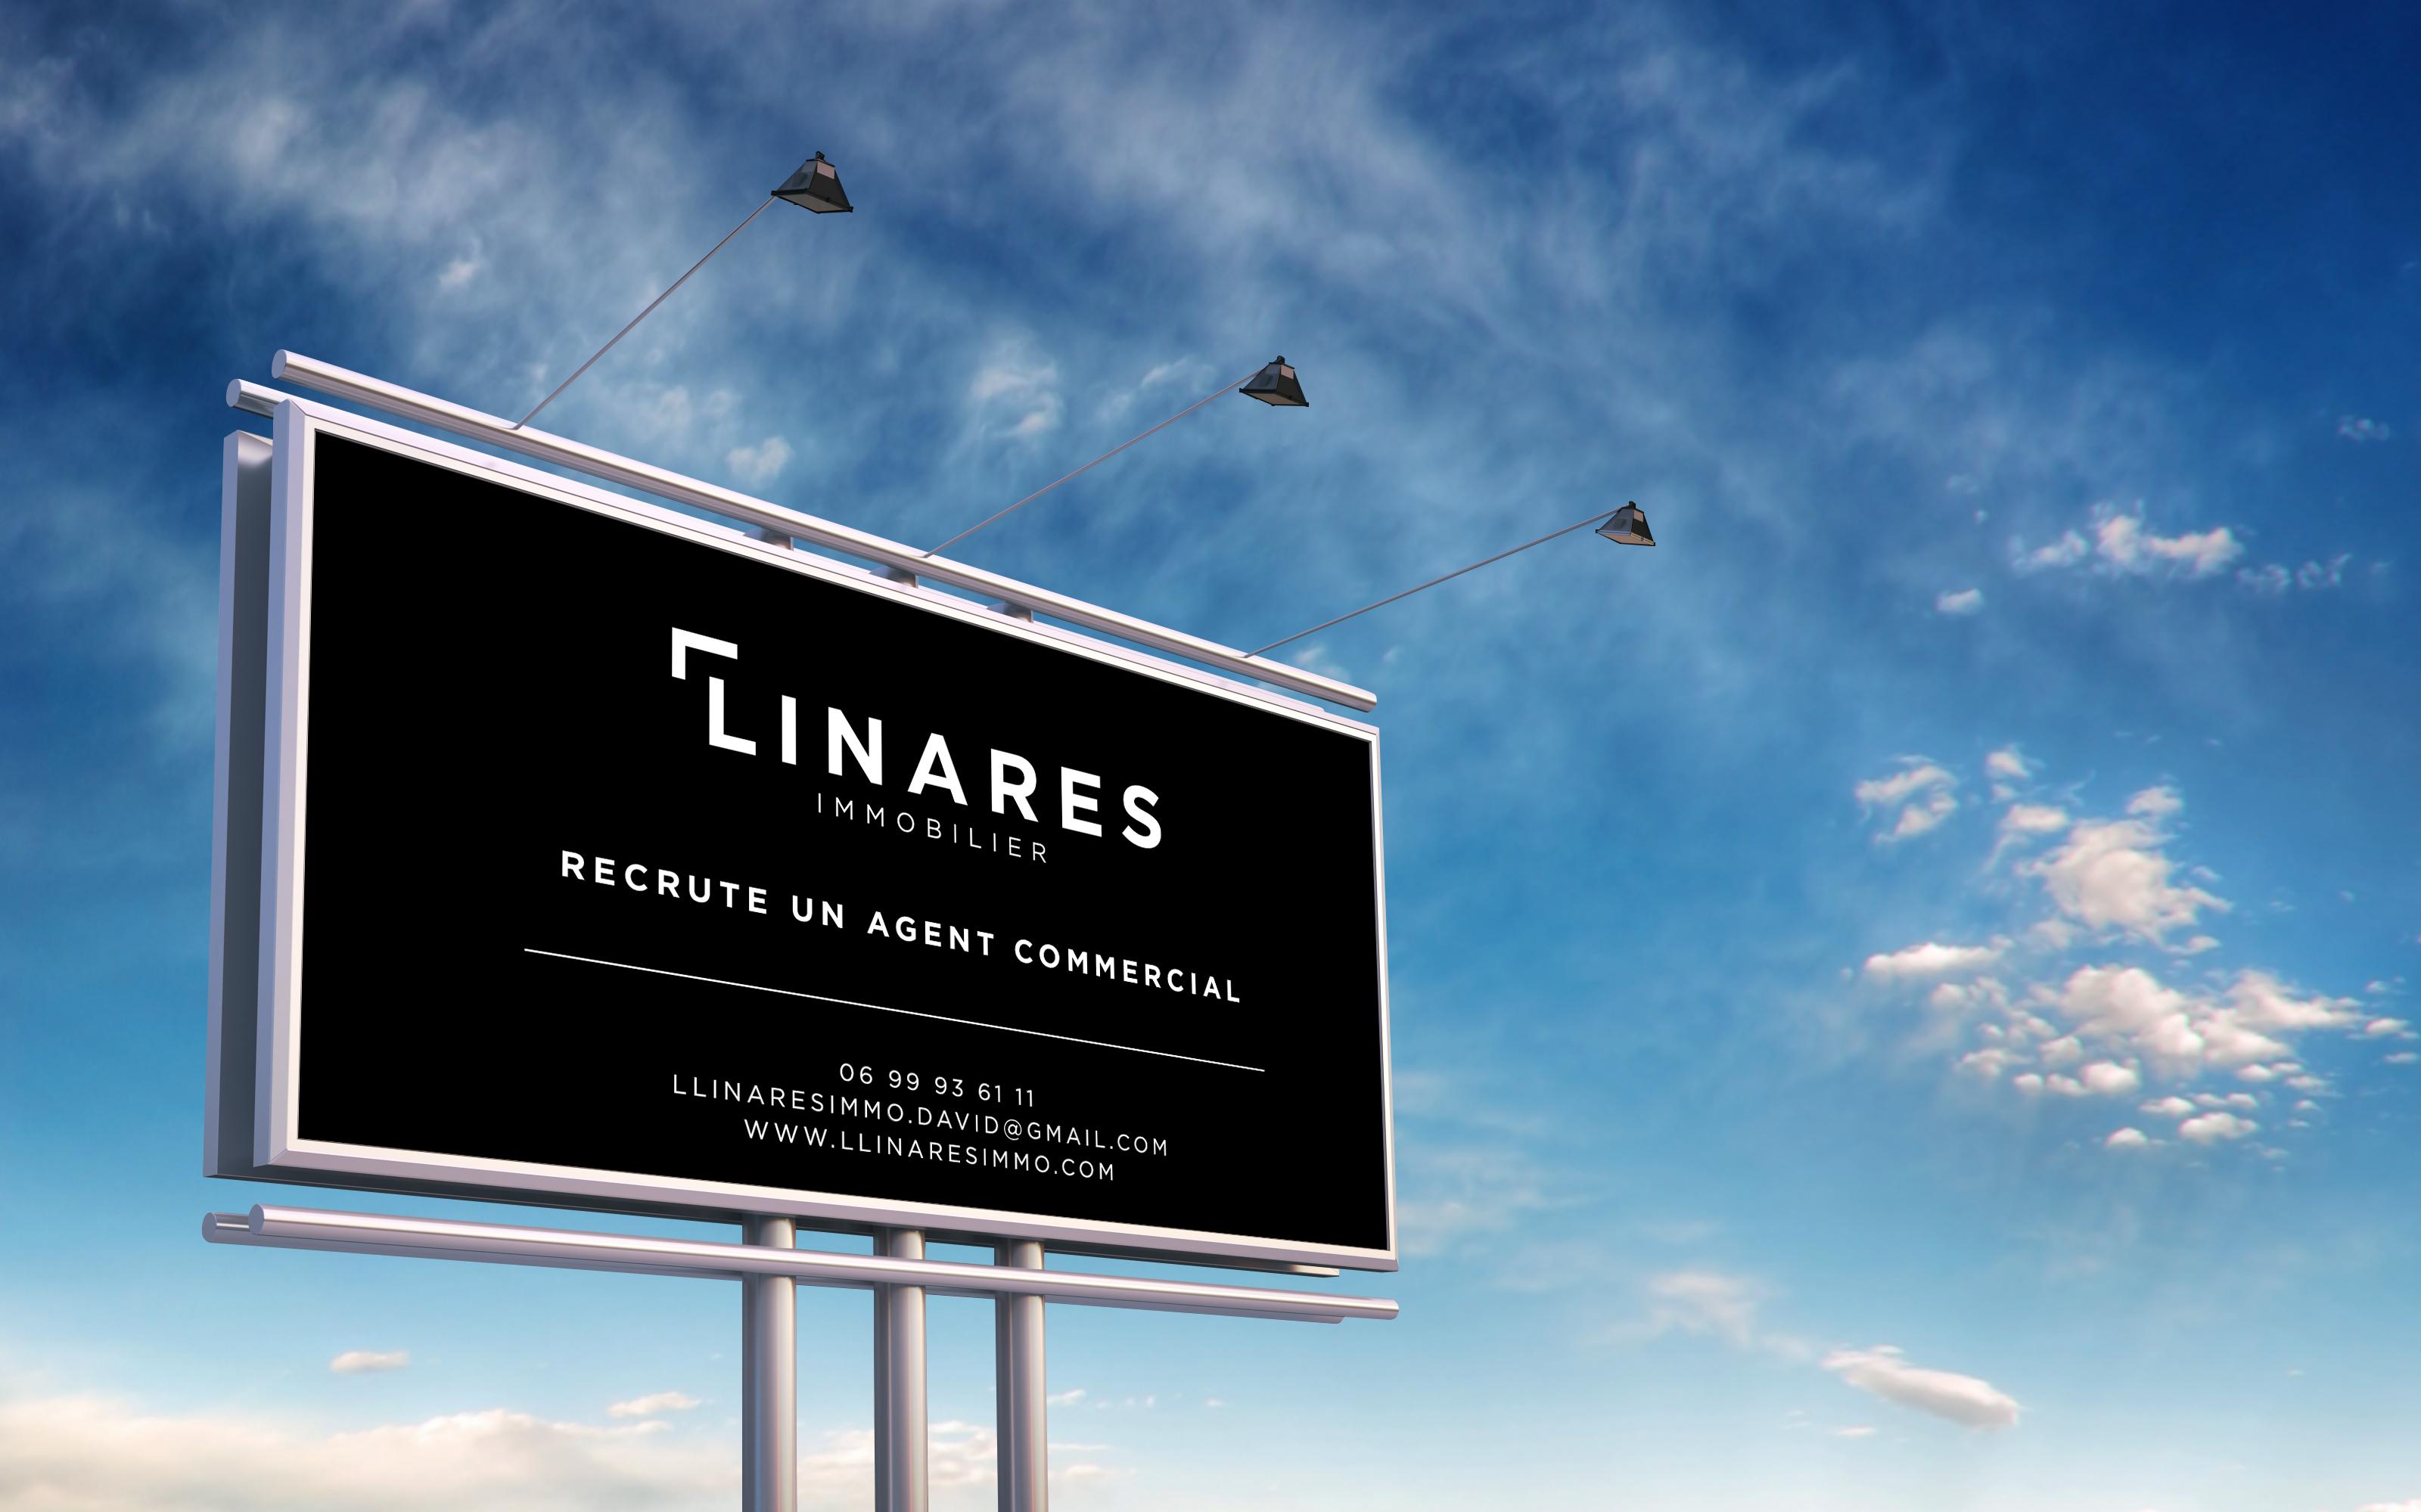 LLINARES IMMOBILIER